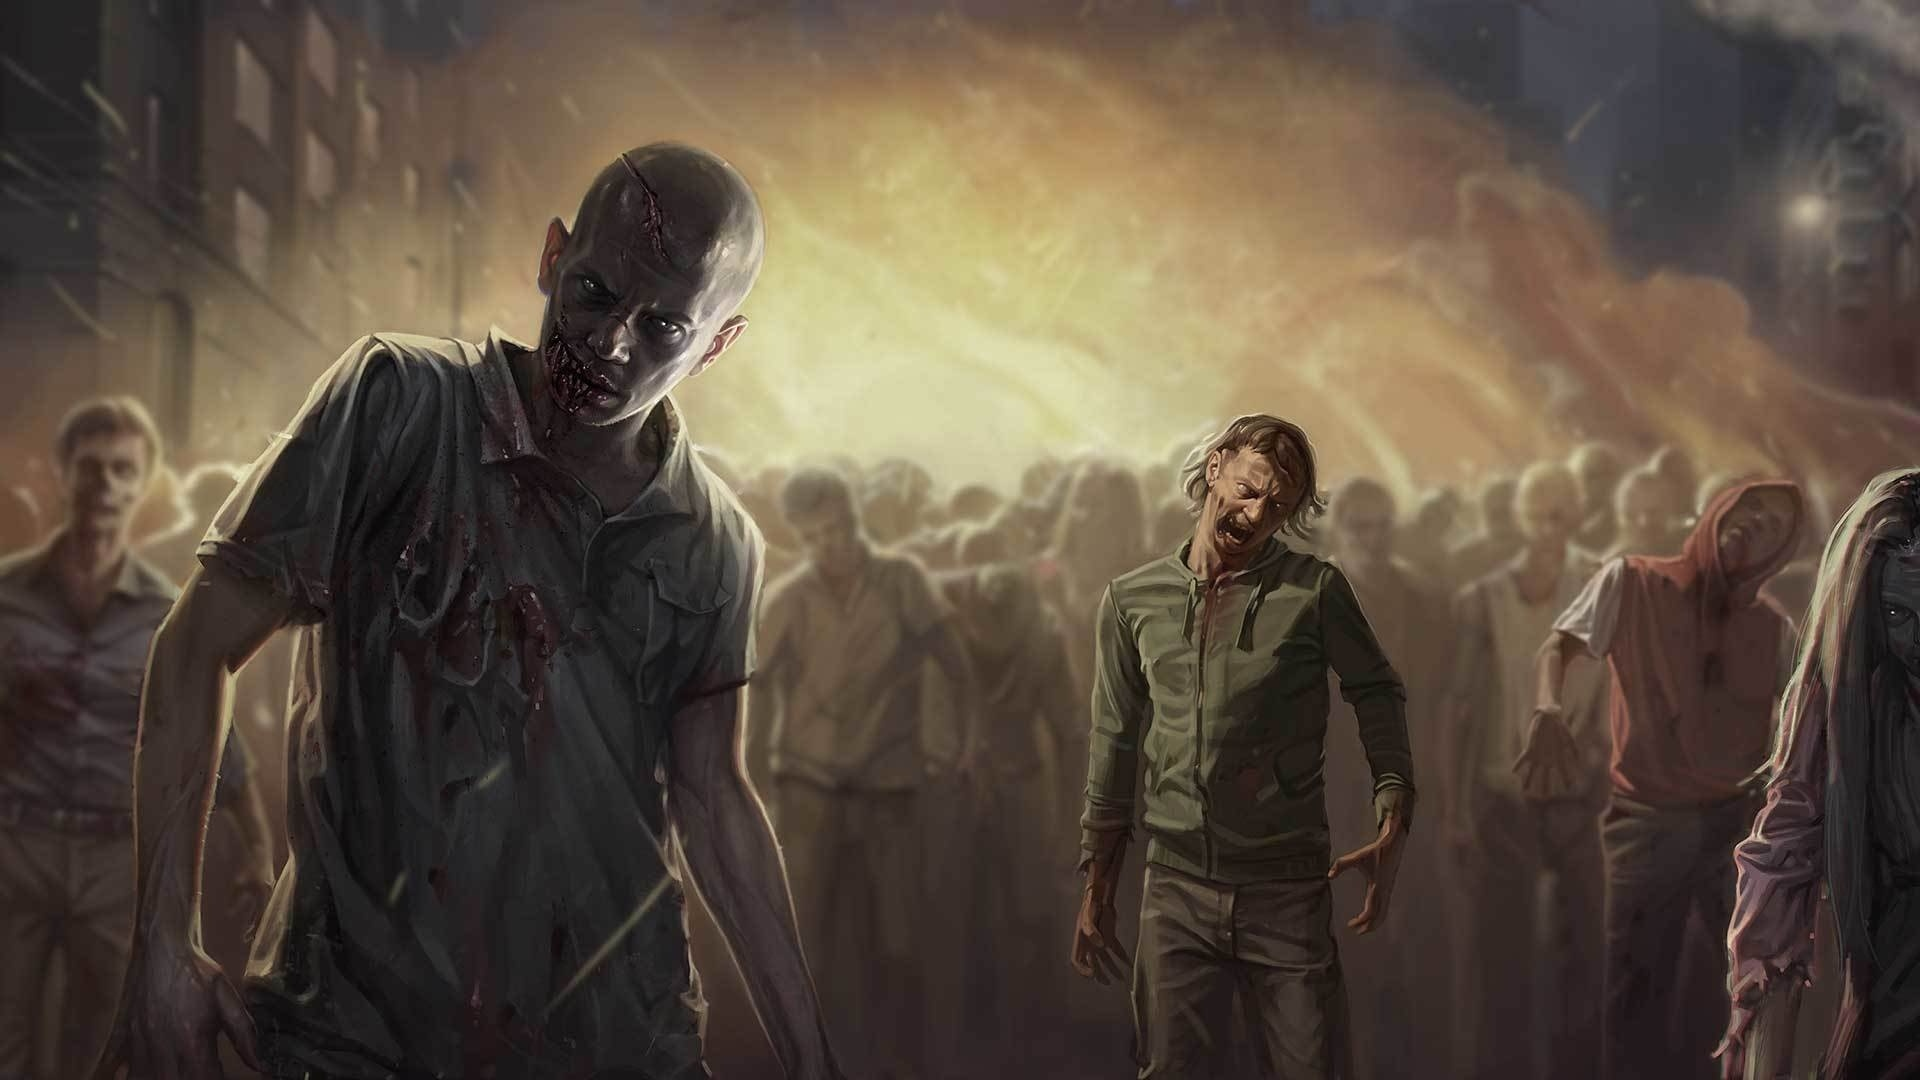 Zombie cool wallpaper